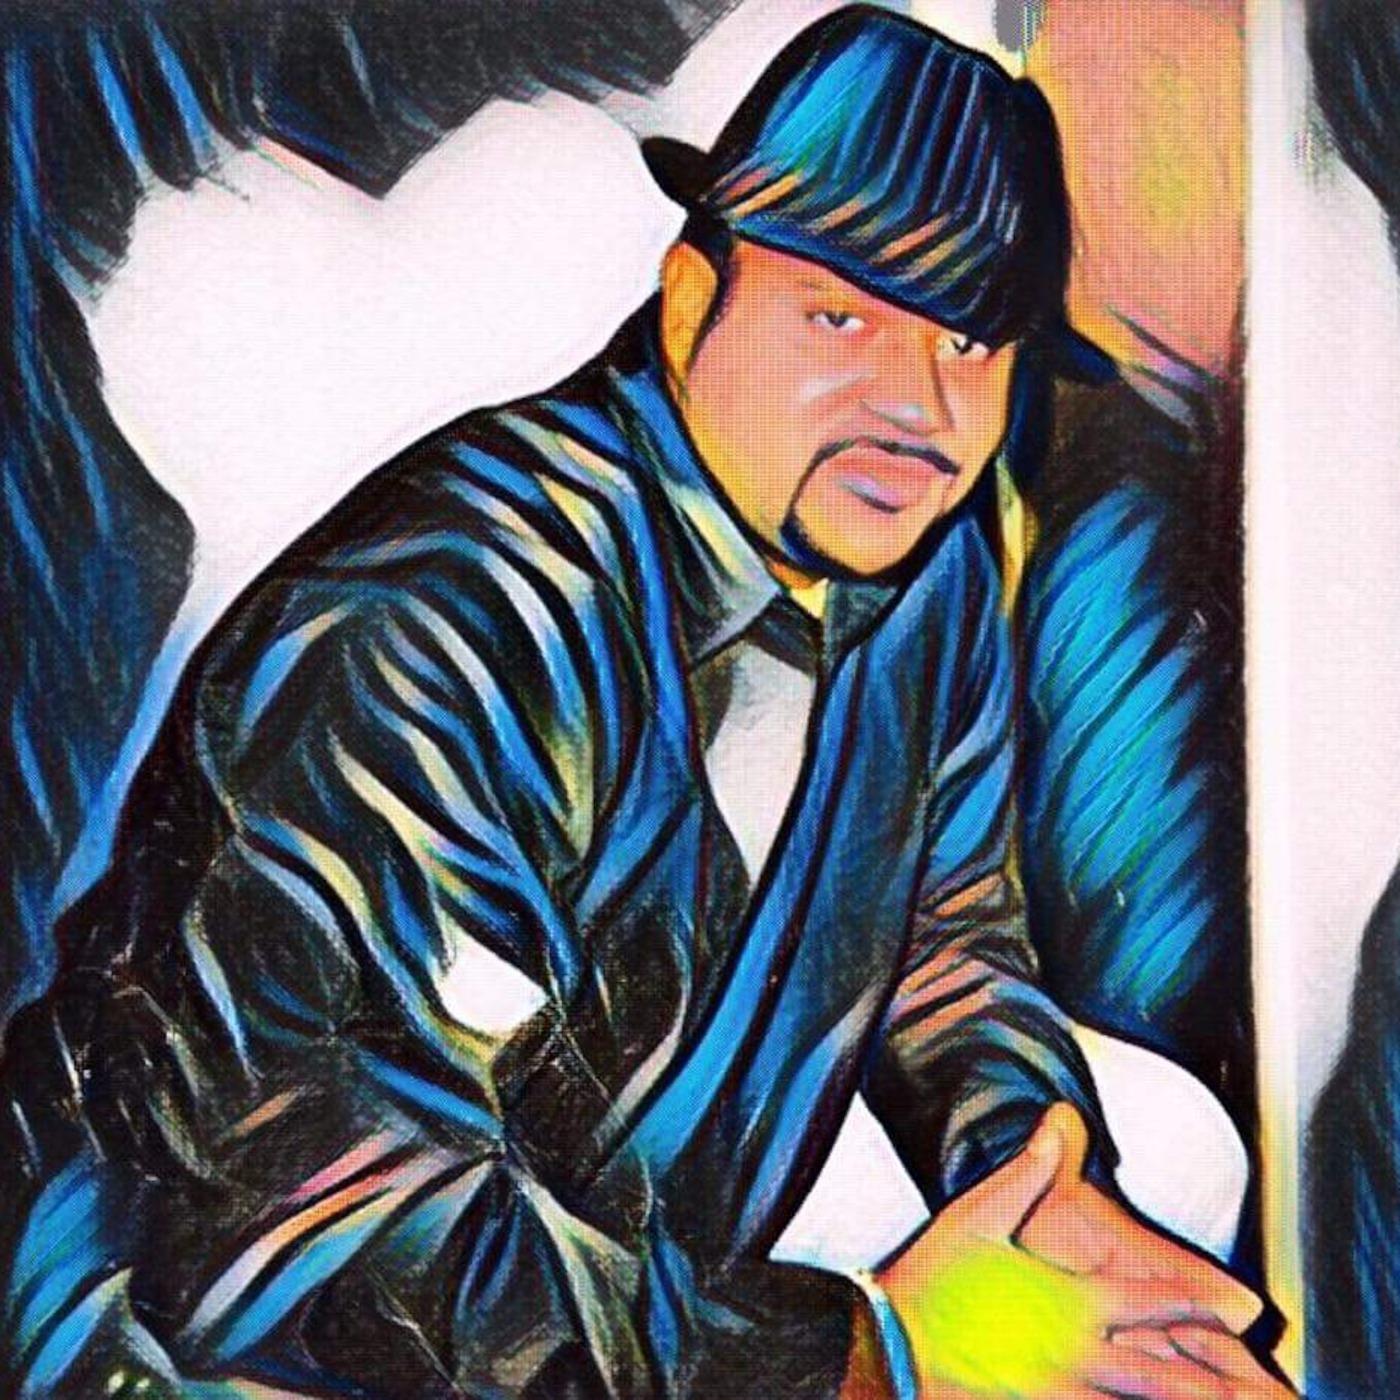 Dj Boogie Down Brown